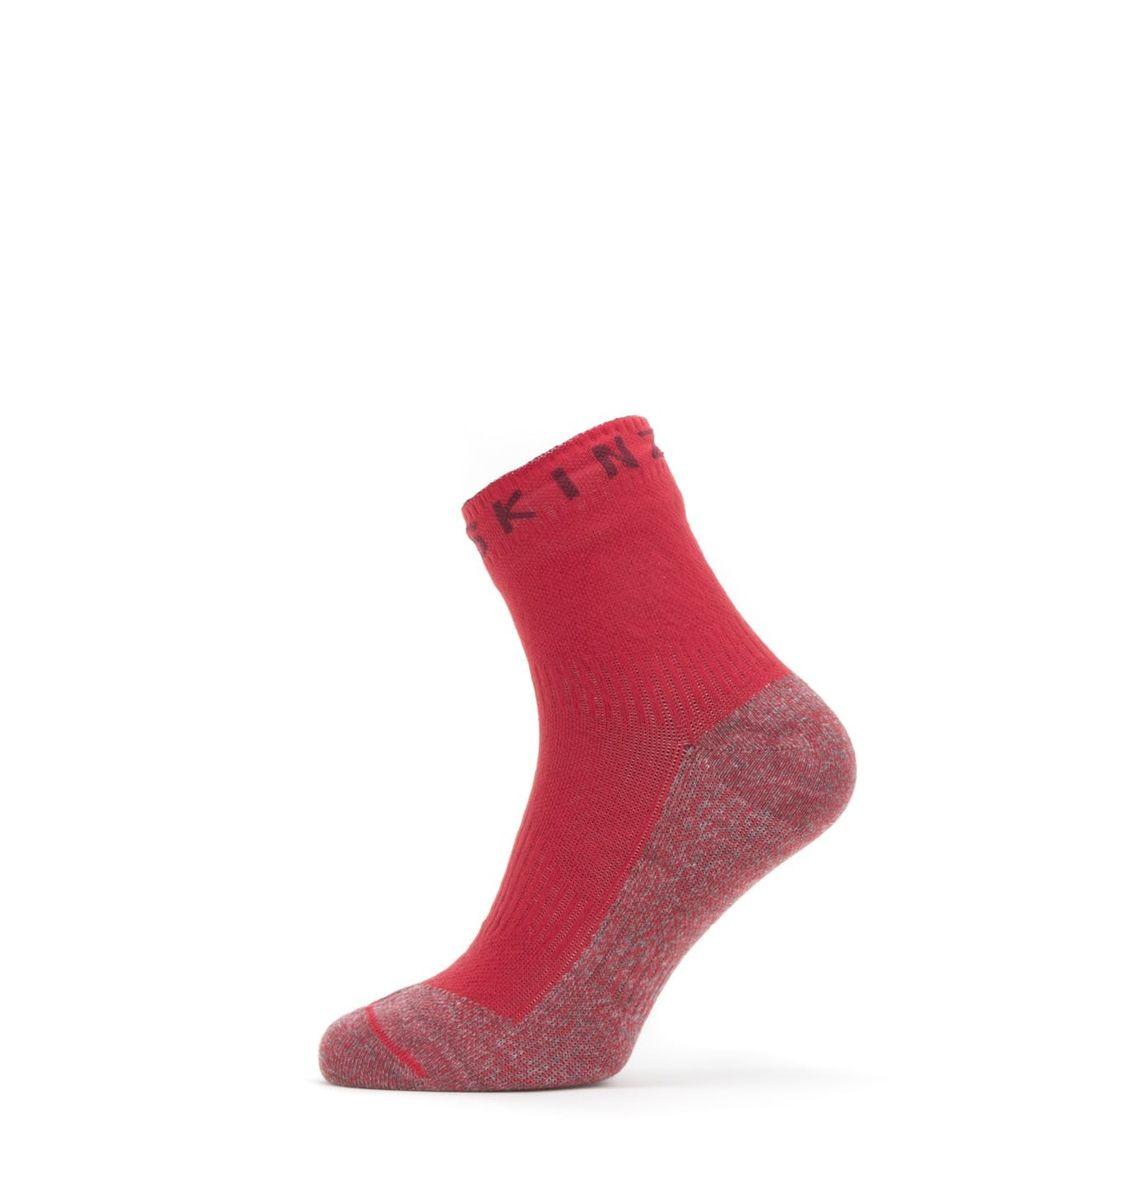 Sealskinz Waterproof Soft Touch Mid Length Socks